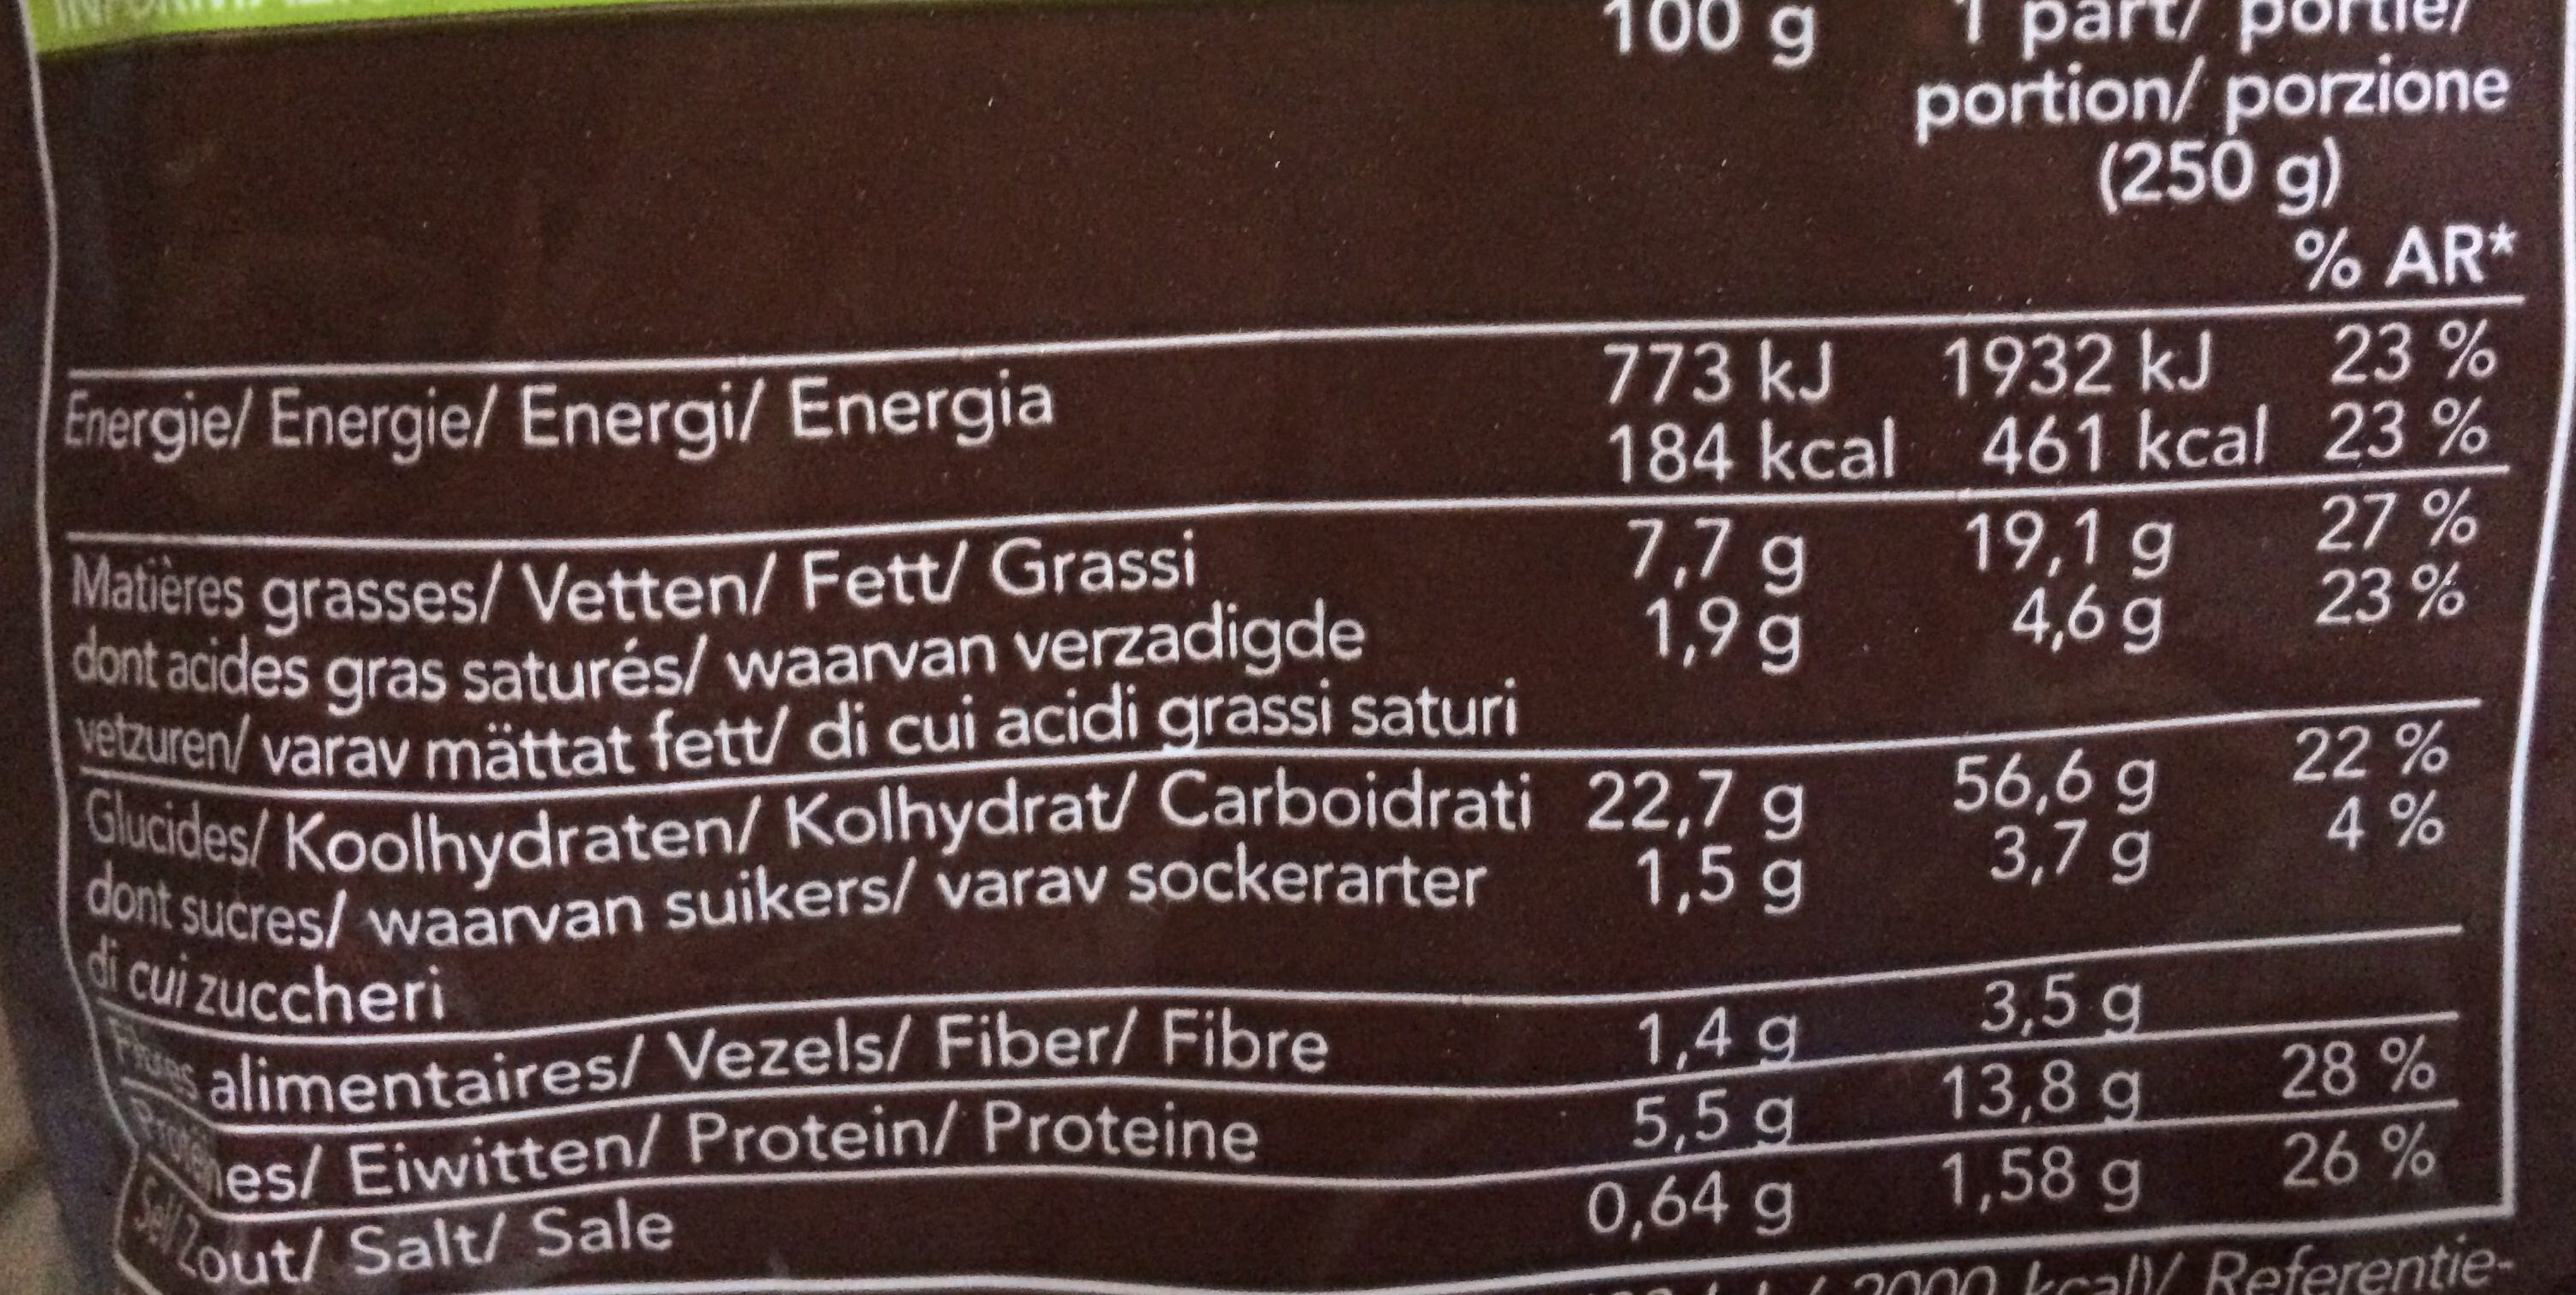 Pâtes linguines aux pesto rosso - Voedigswaarden